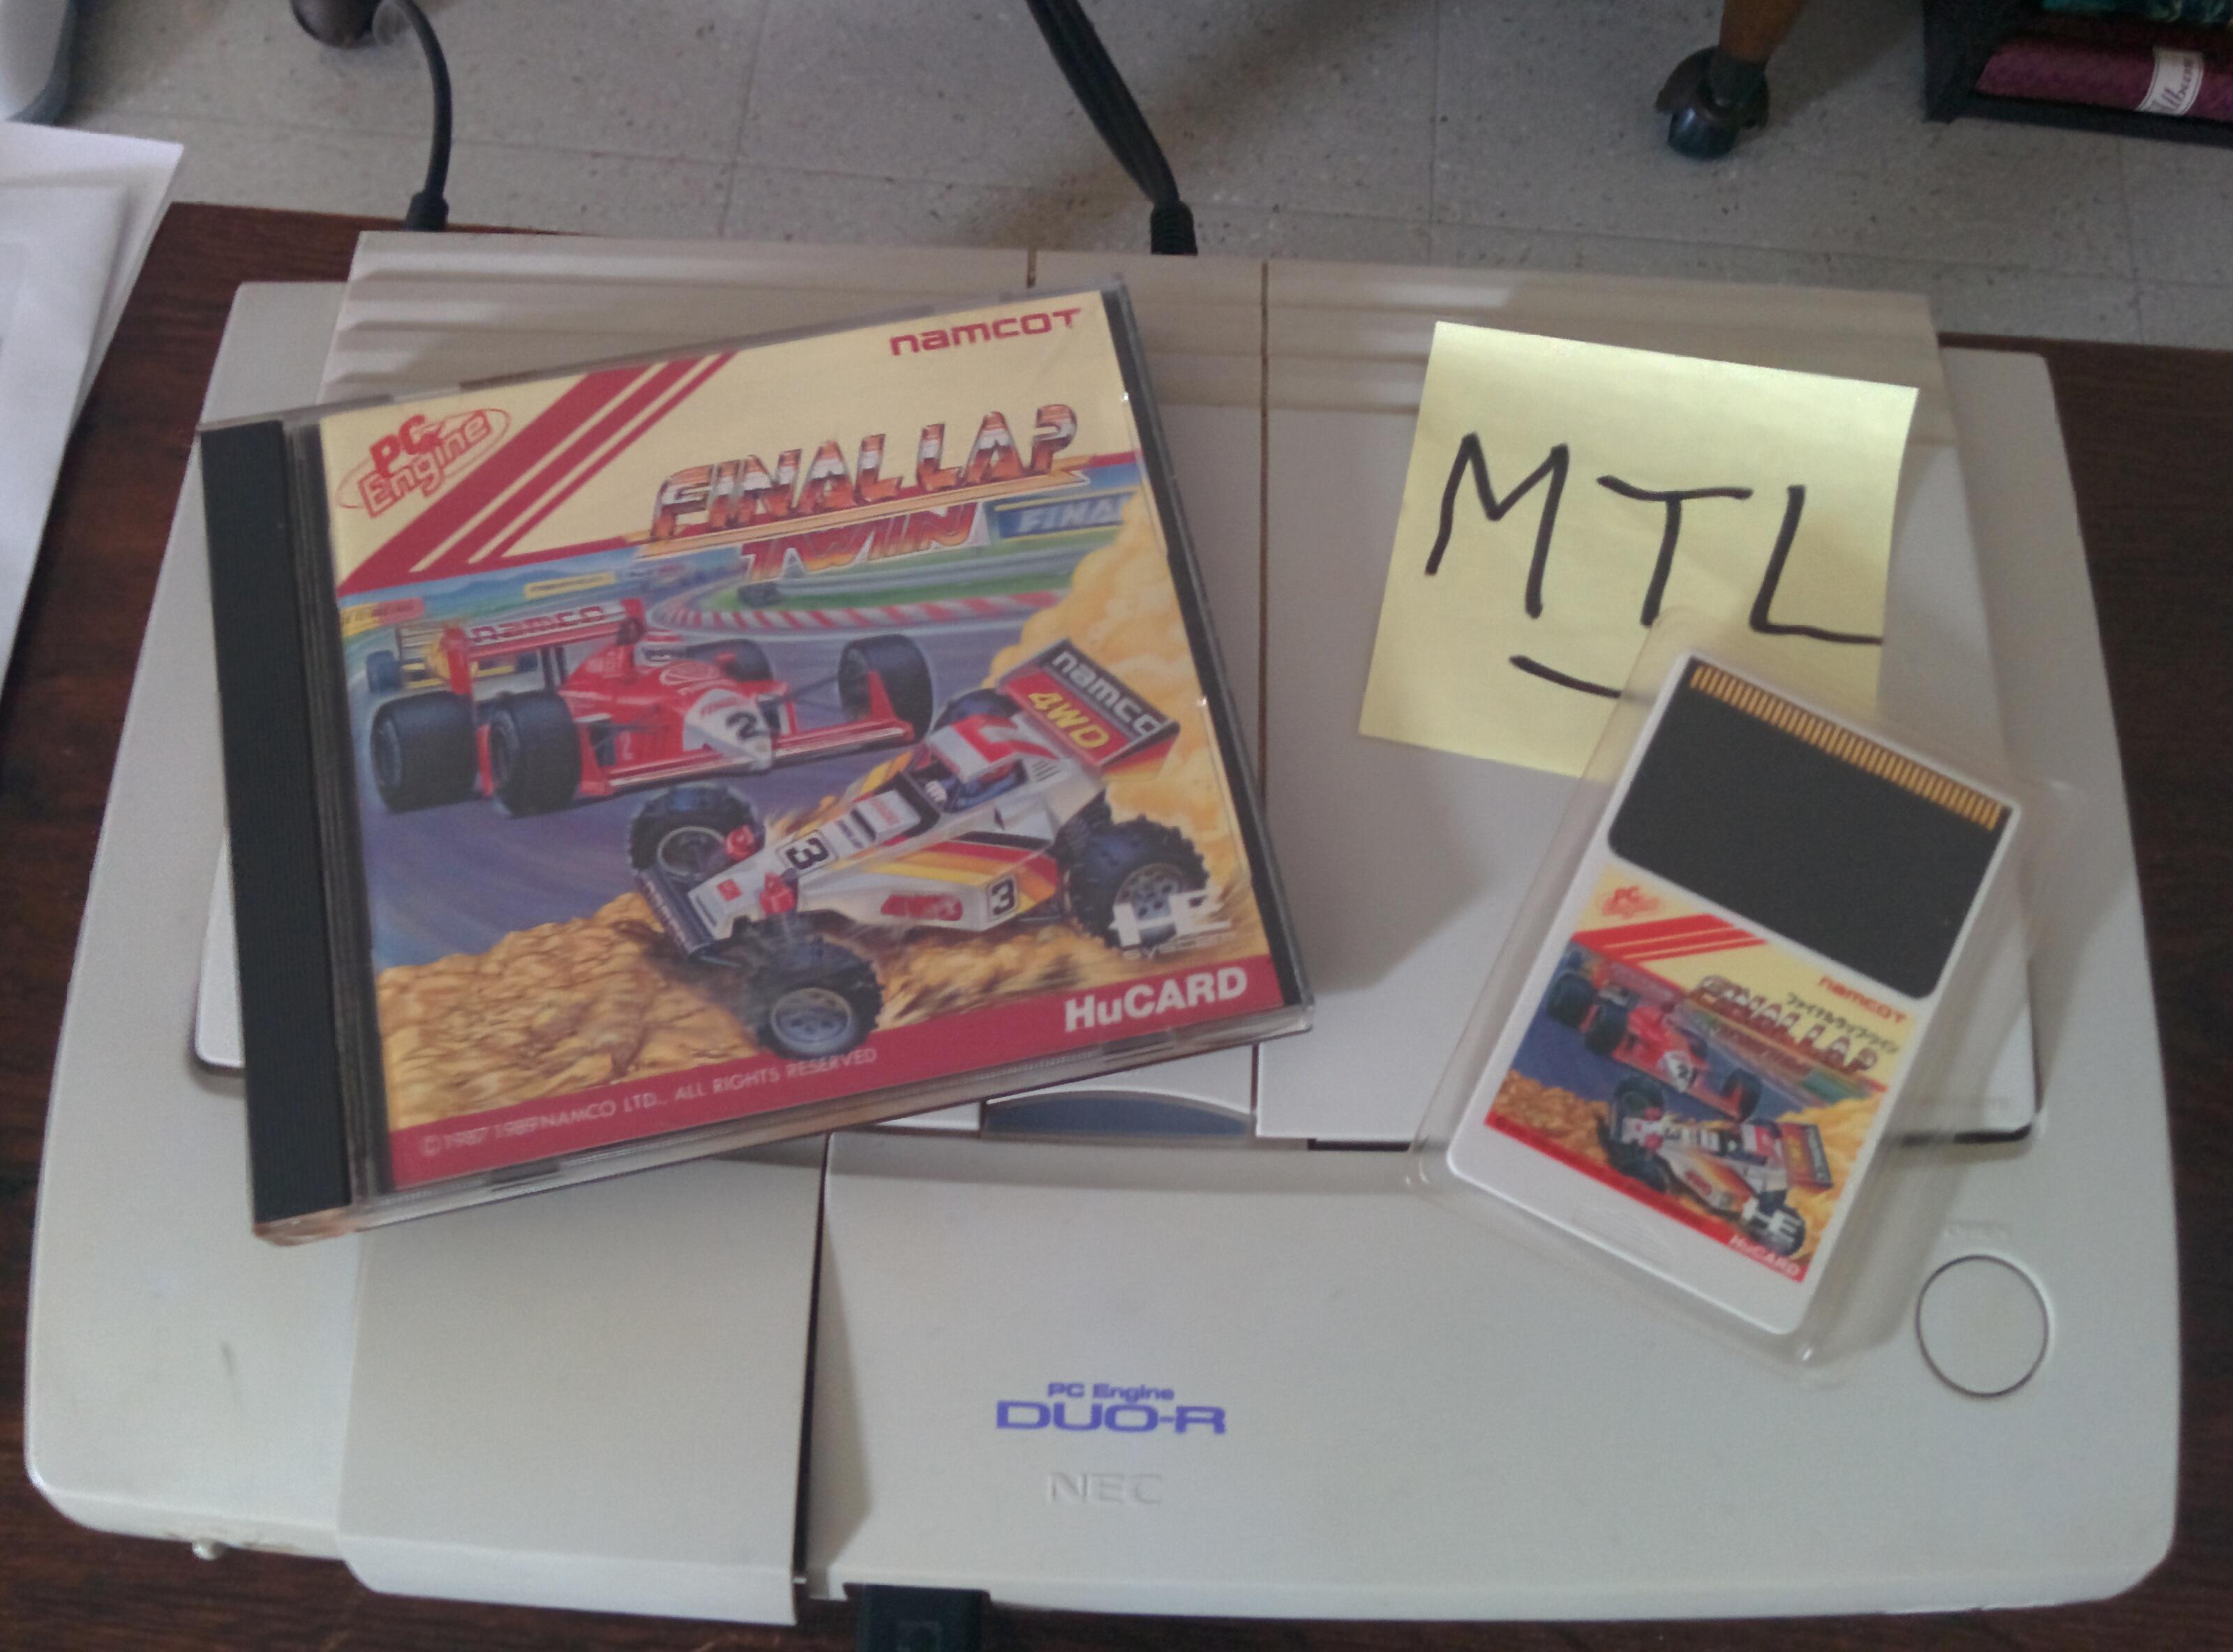 Mantalow: Final Lap Twin [Test/ 1 Lap/ F3000/ Australia] (TurboGrafx-16/PC Engine) 0:00:45.27 points on 2016-02-08 09:59:51